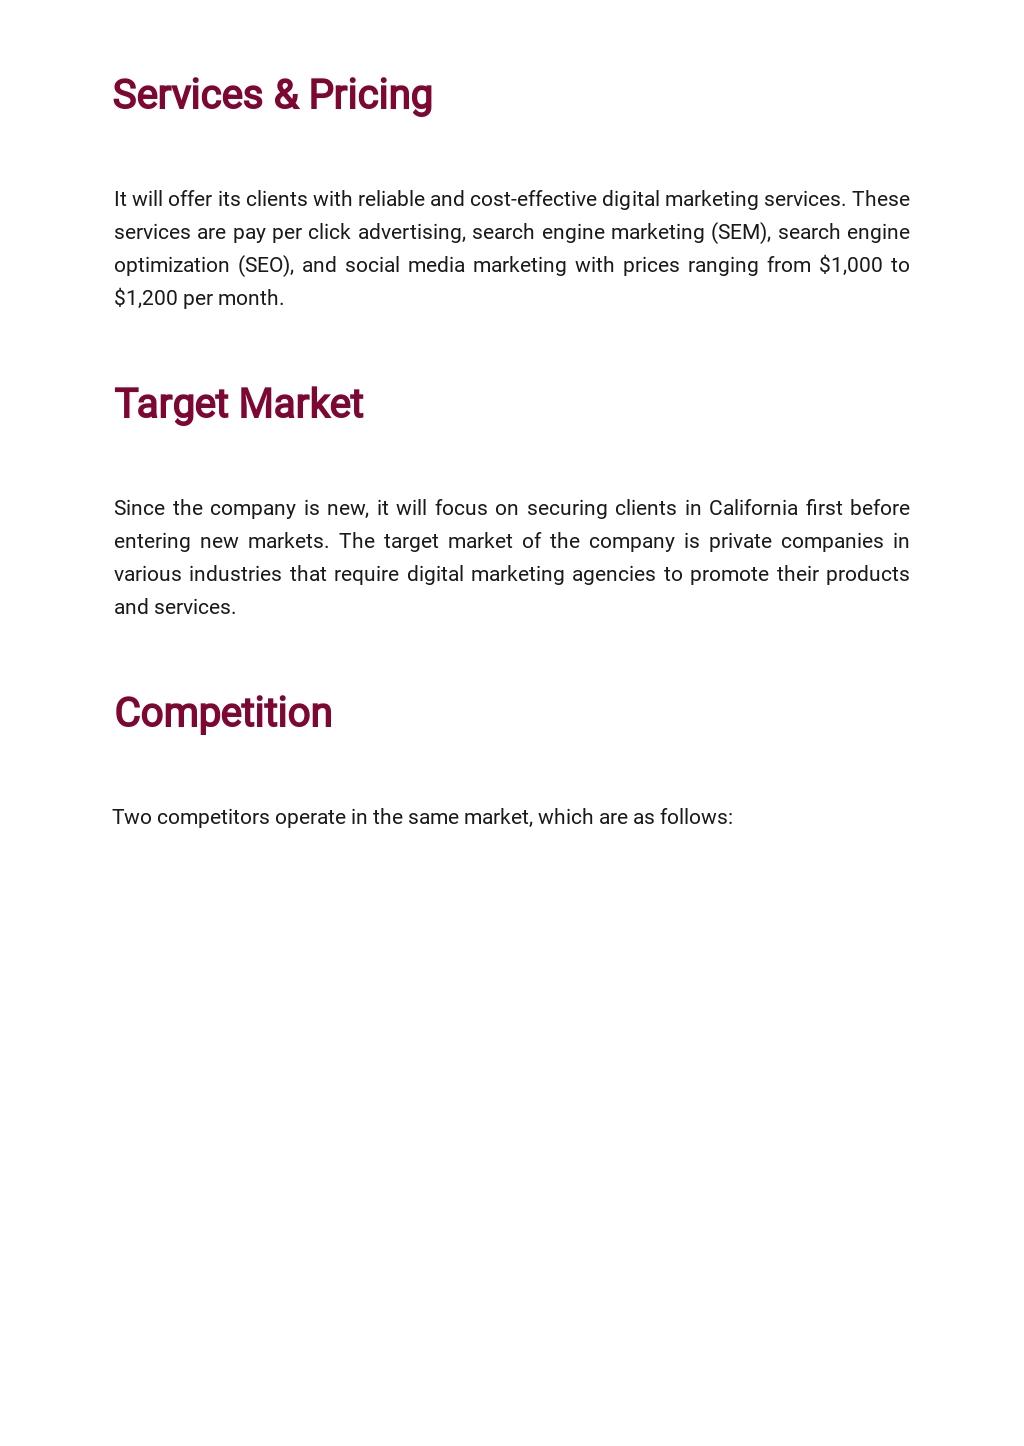 Marketing Agency Business Plan Template 2.jpe